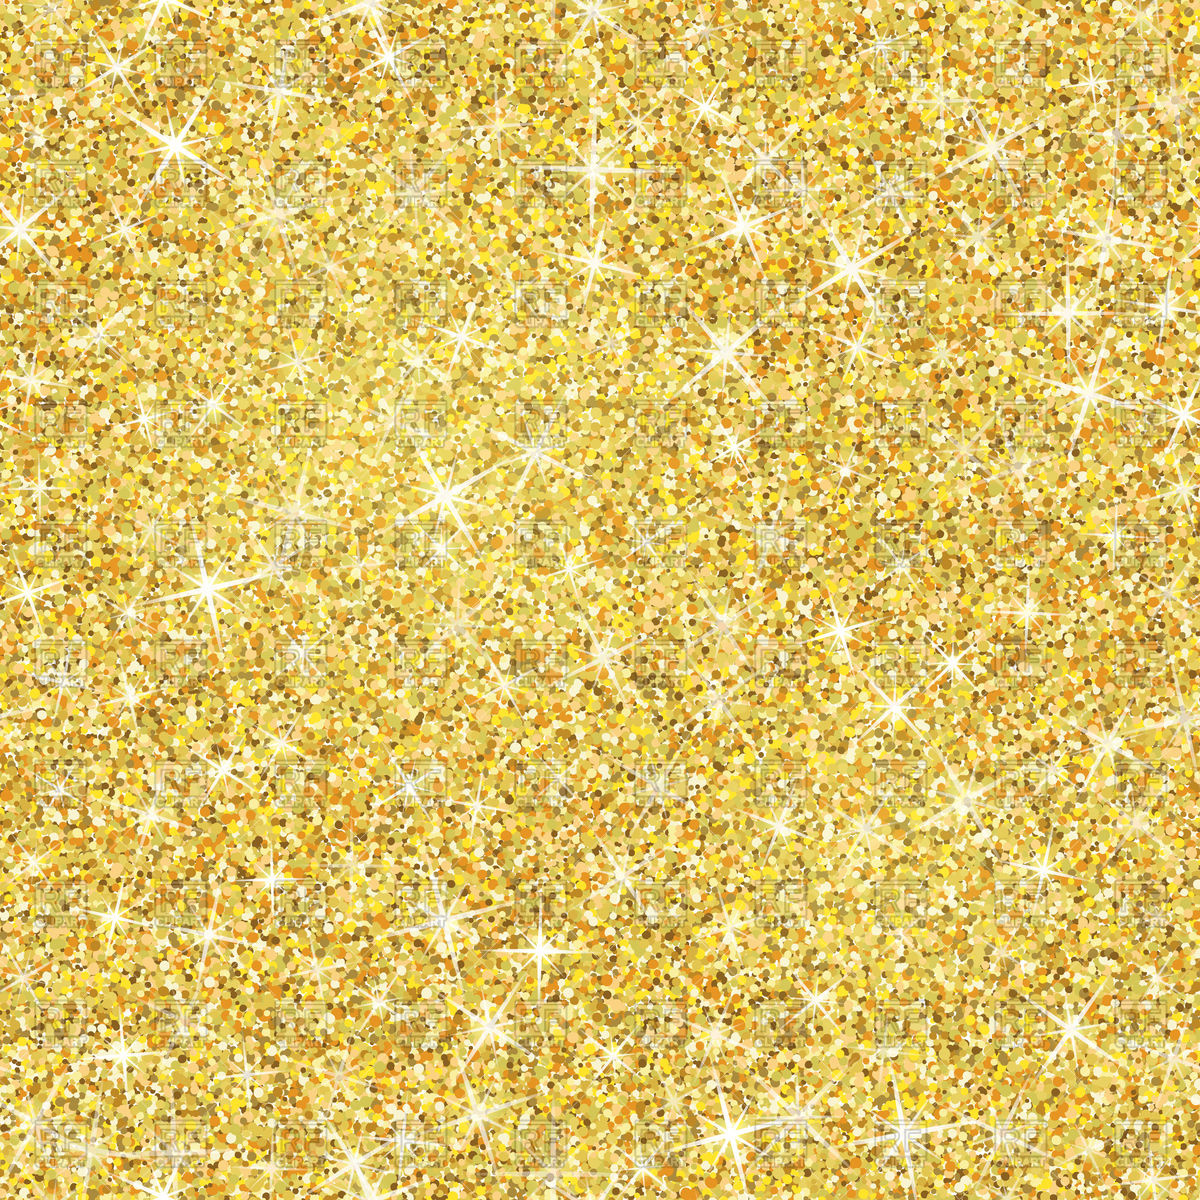 1200x1200 Seamless Gold Glitter Texture Vector Image Vector Artwork Of